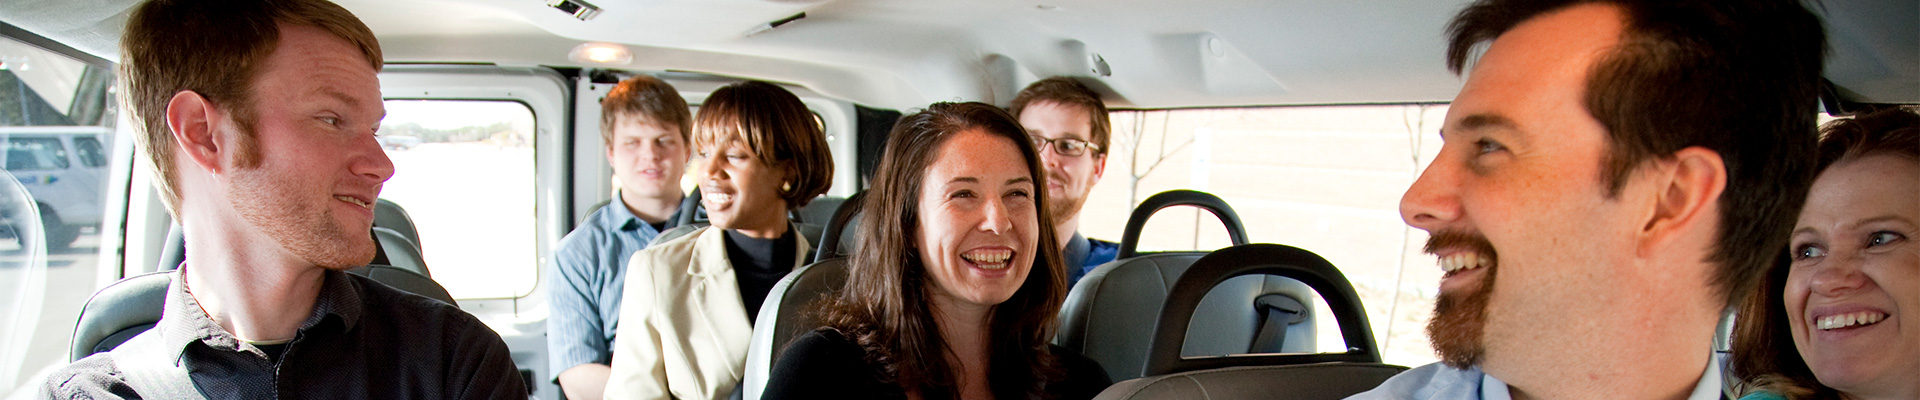 Ridesharing group talking and laughing inside vanpool van